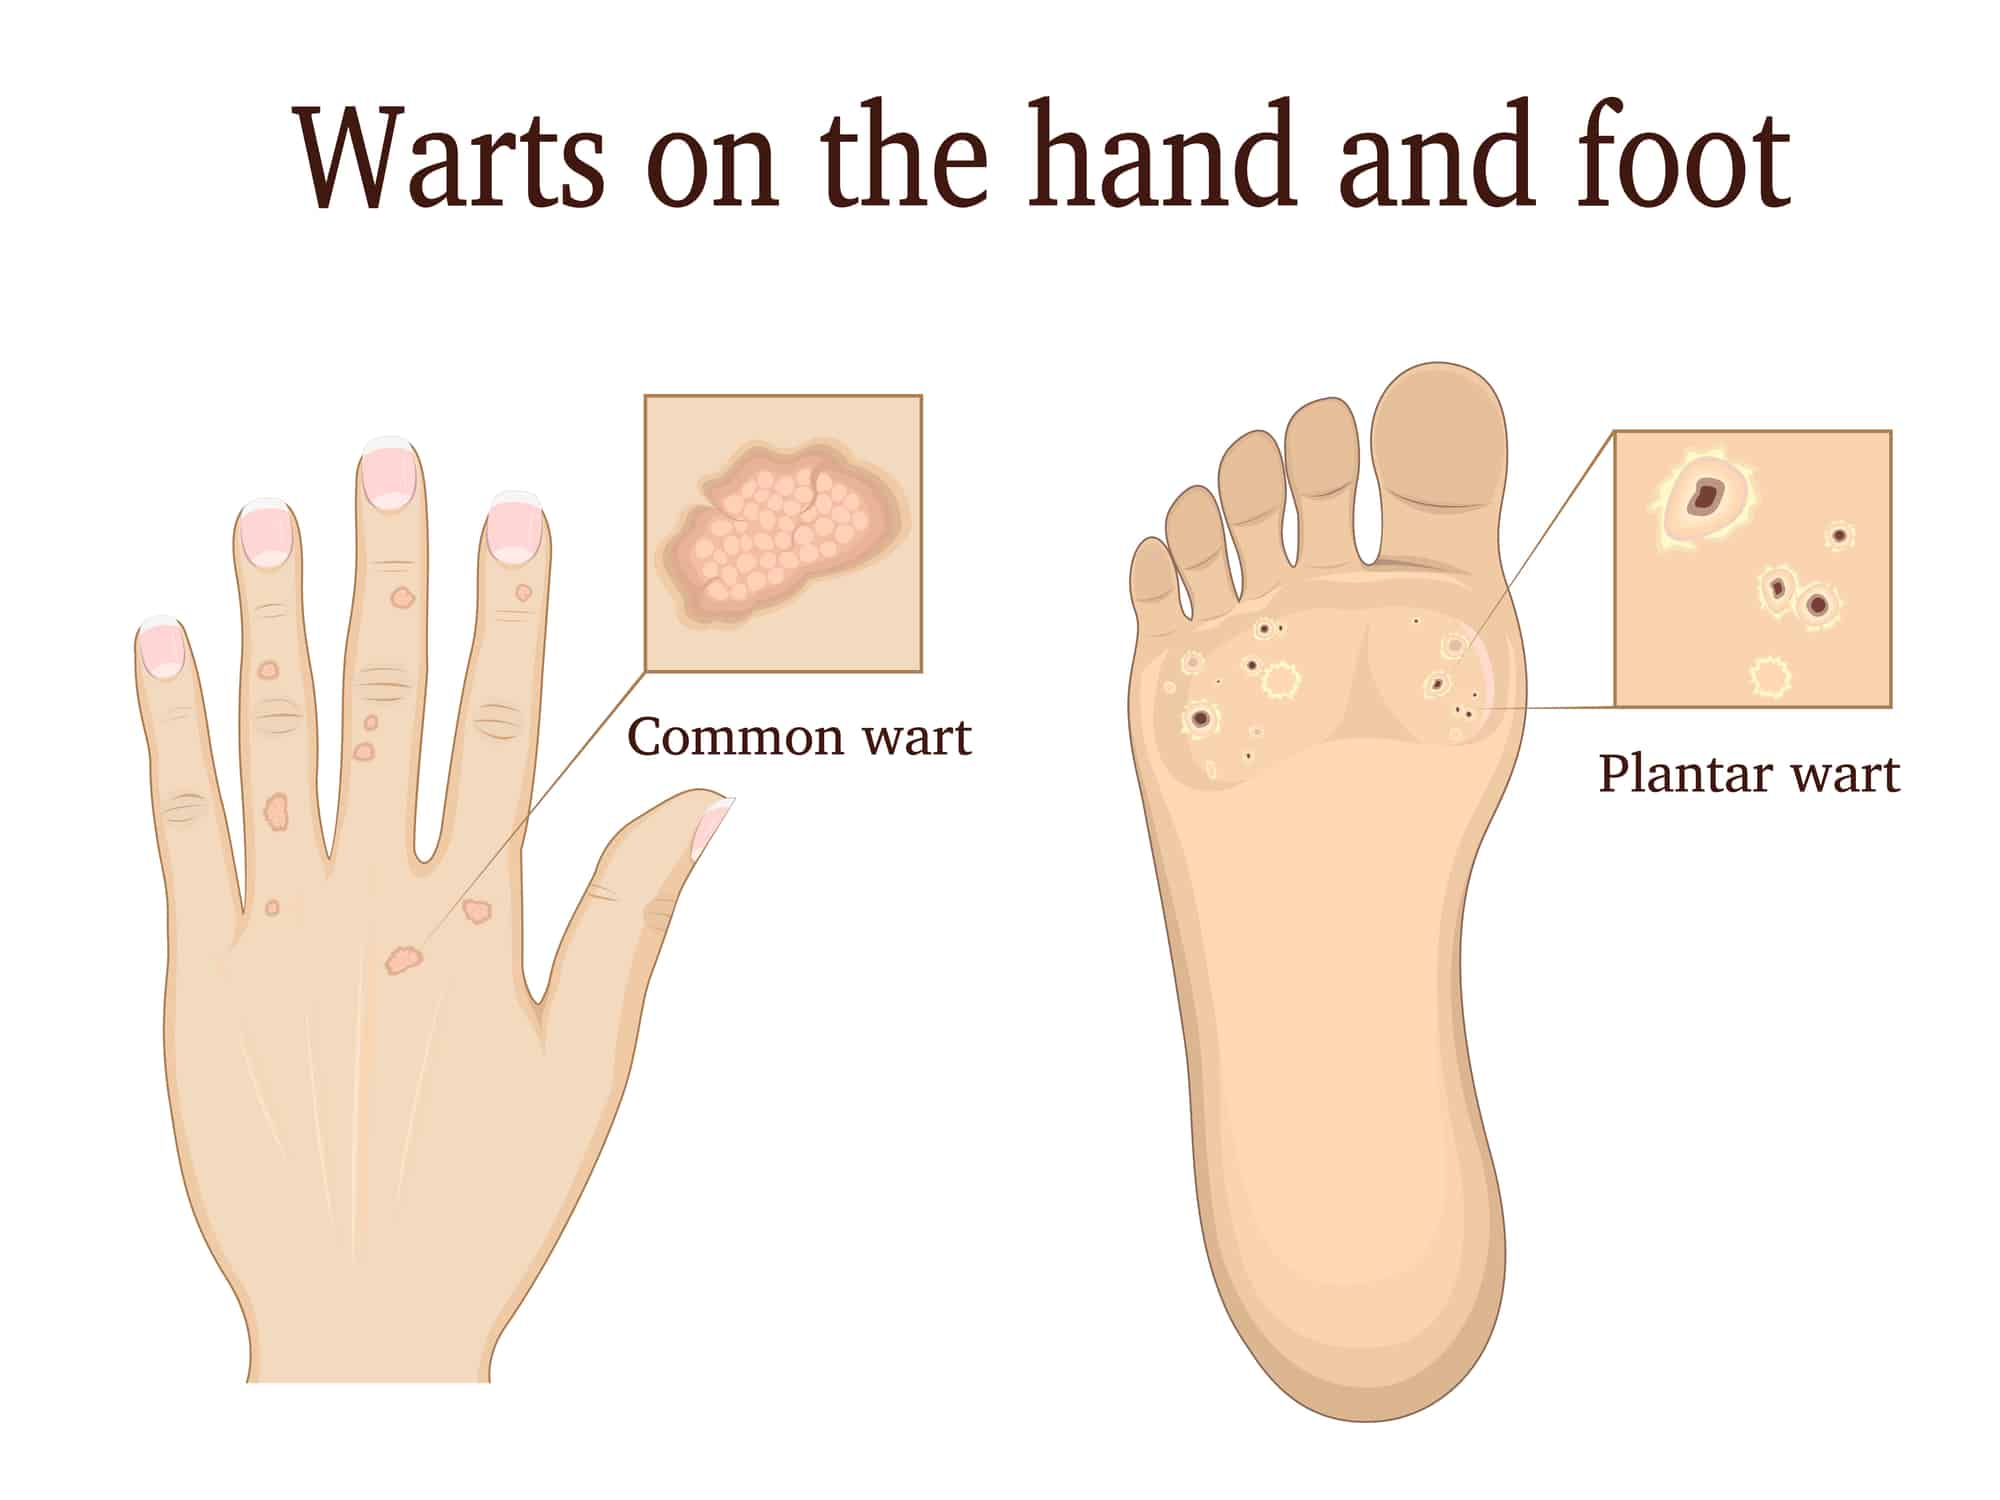 warts on hands essential oils)